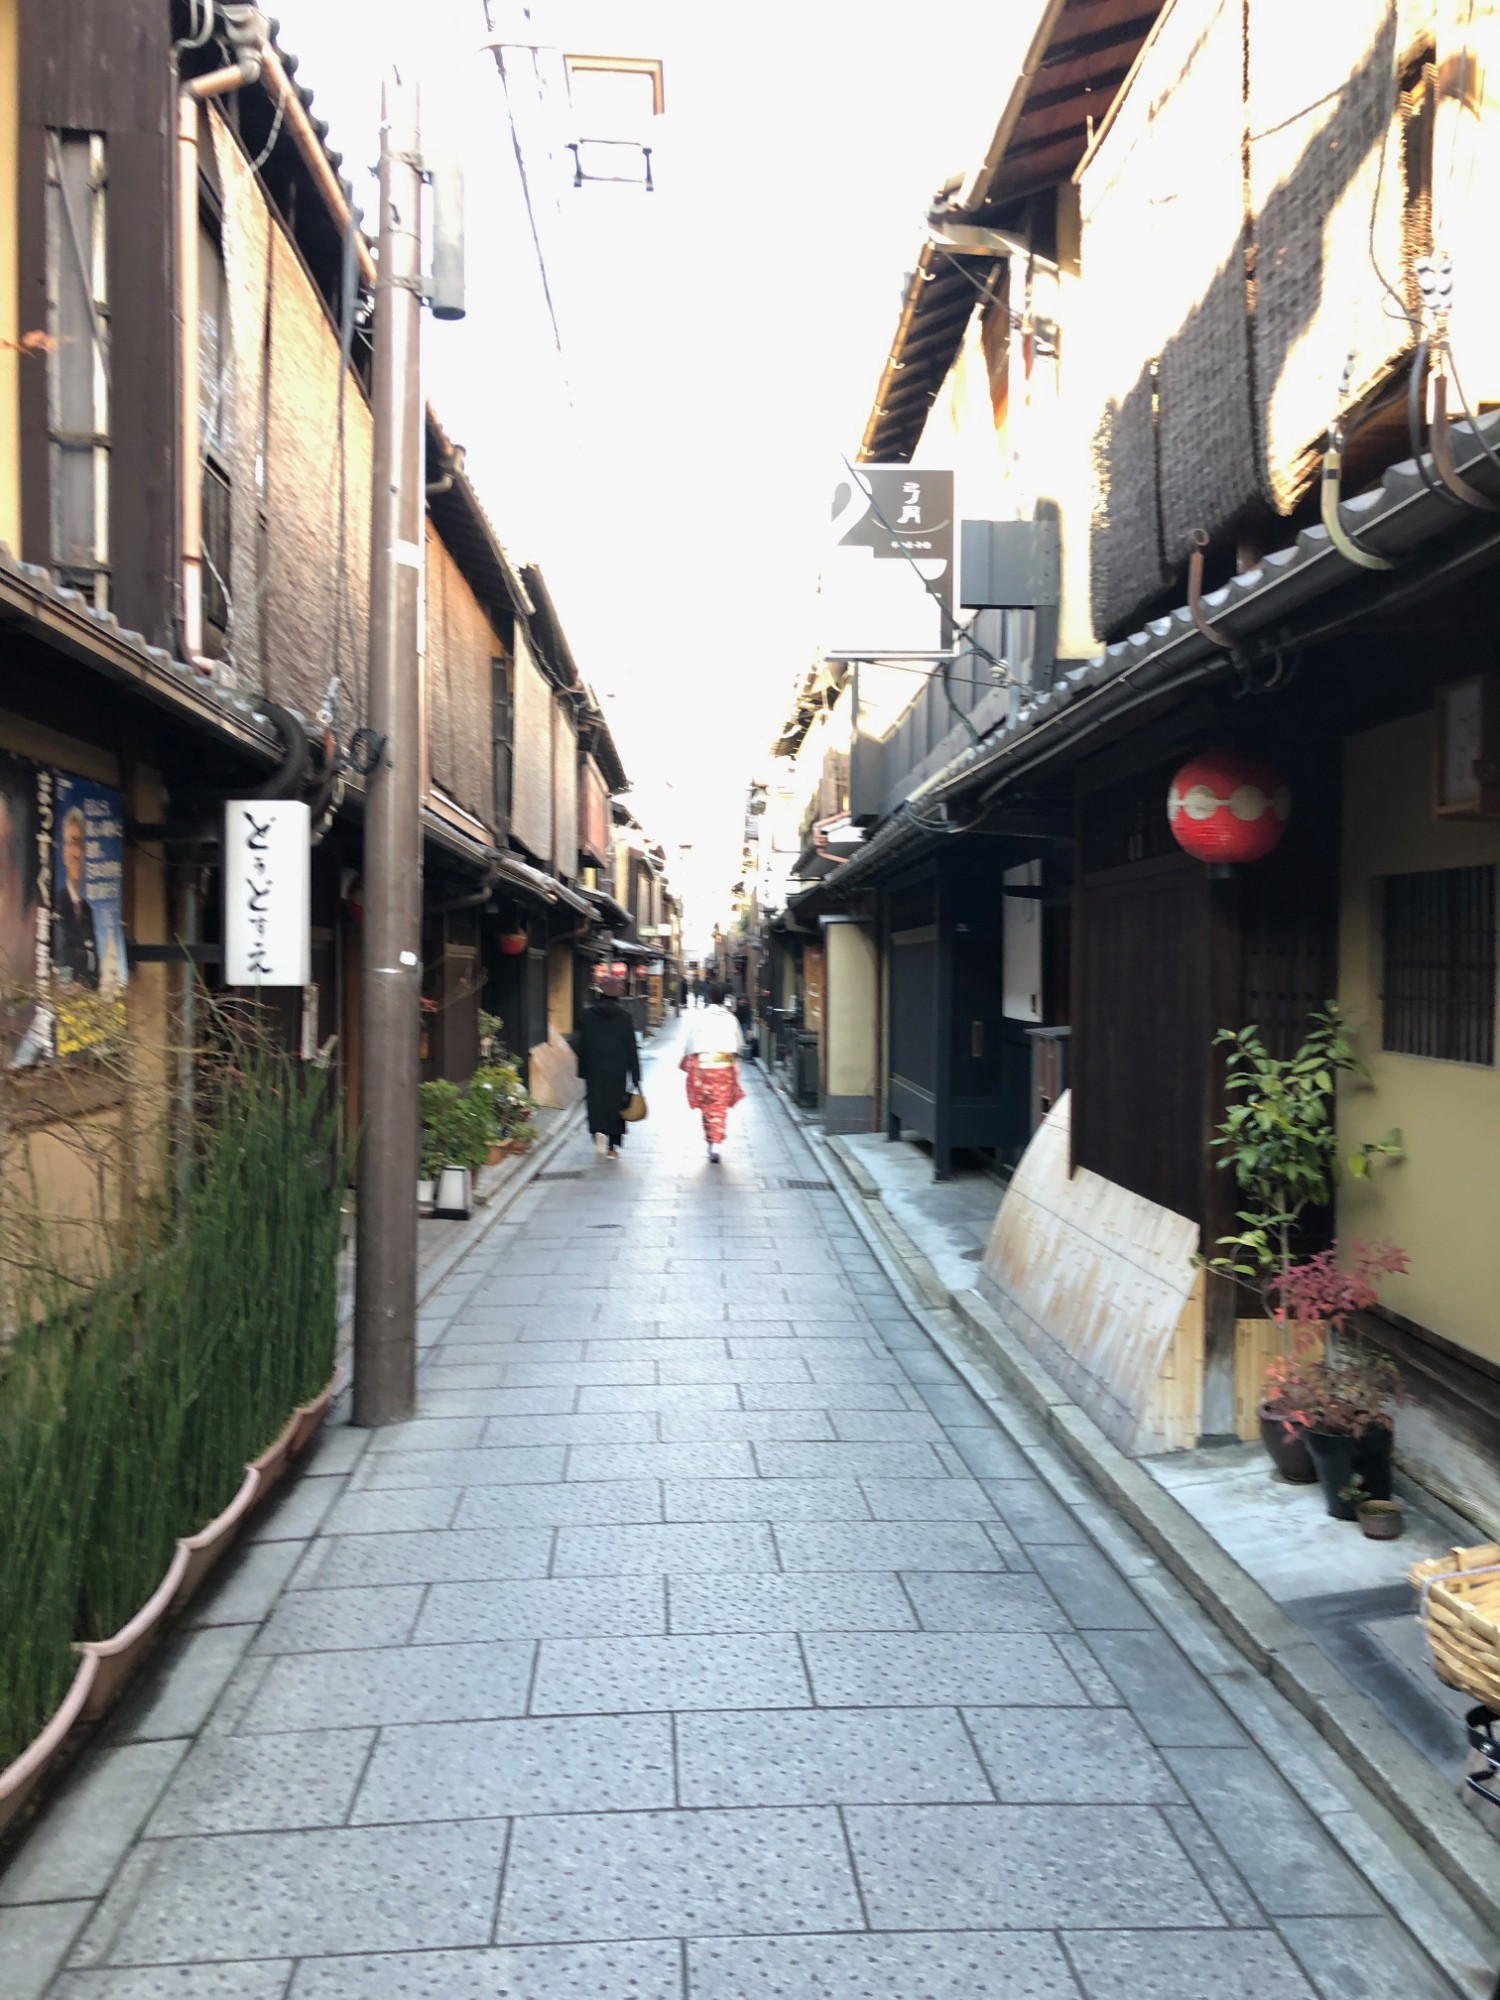 Geisha walks down side street of Gion district in Kyoto, Japan. boldlygotravel.com